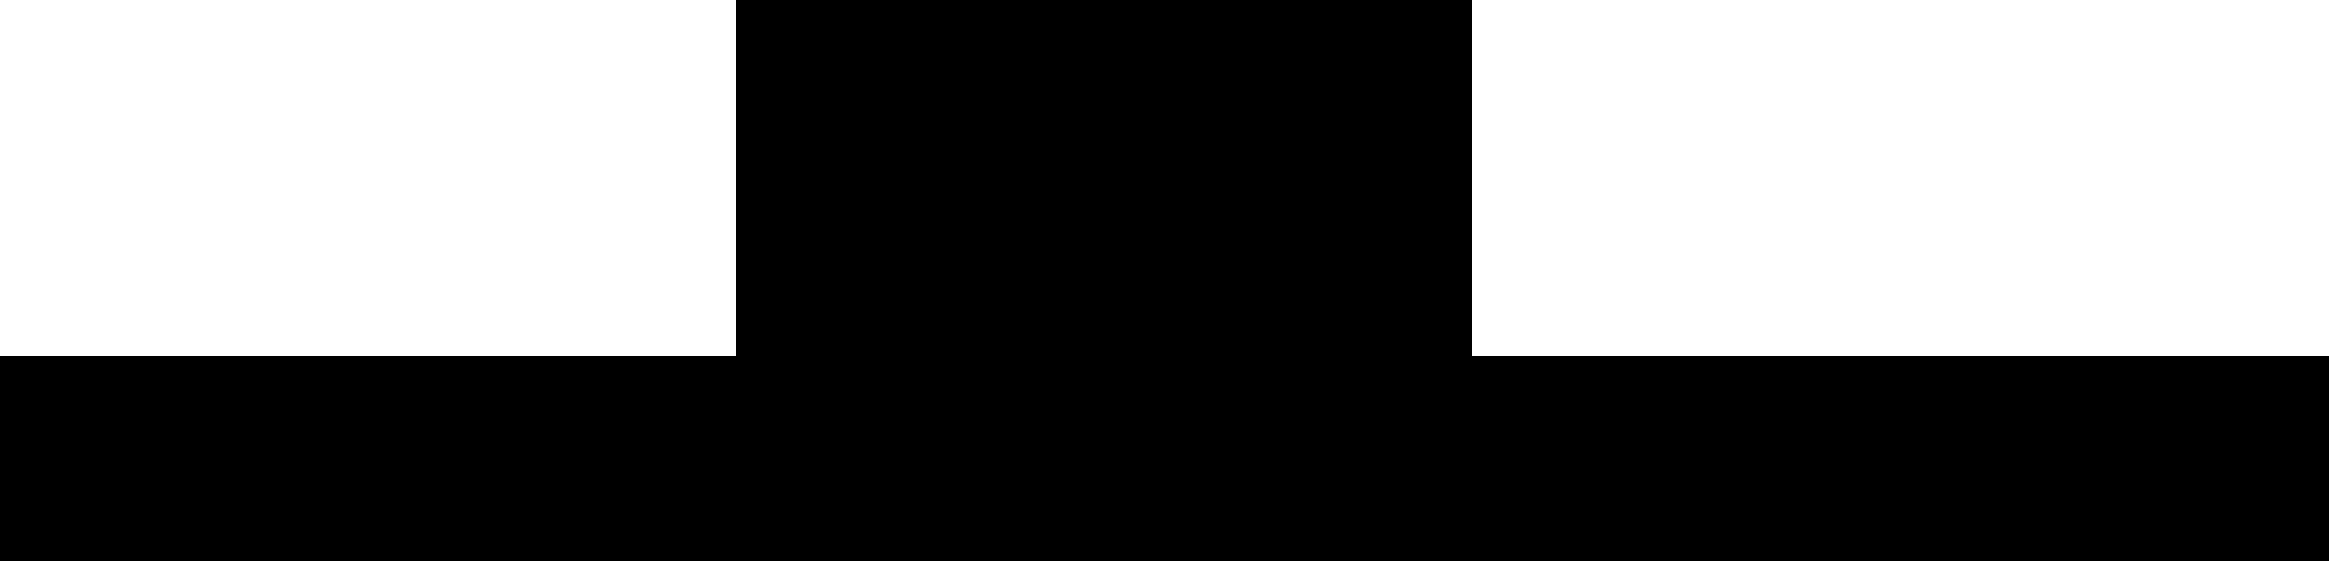 BPOC_LOGO_Vector